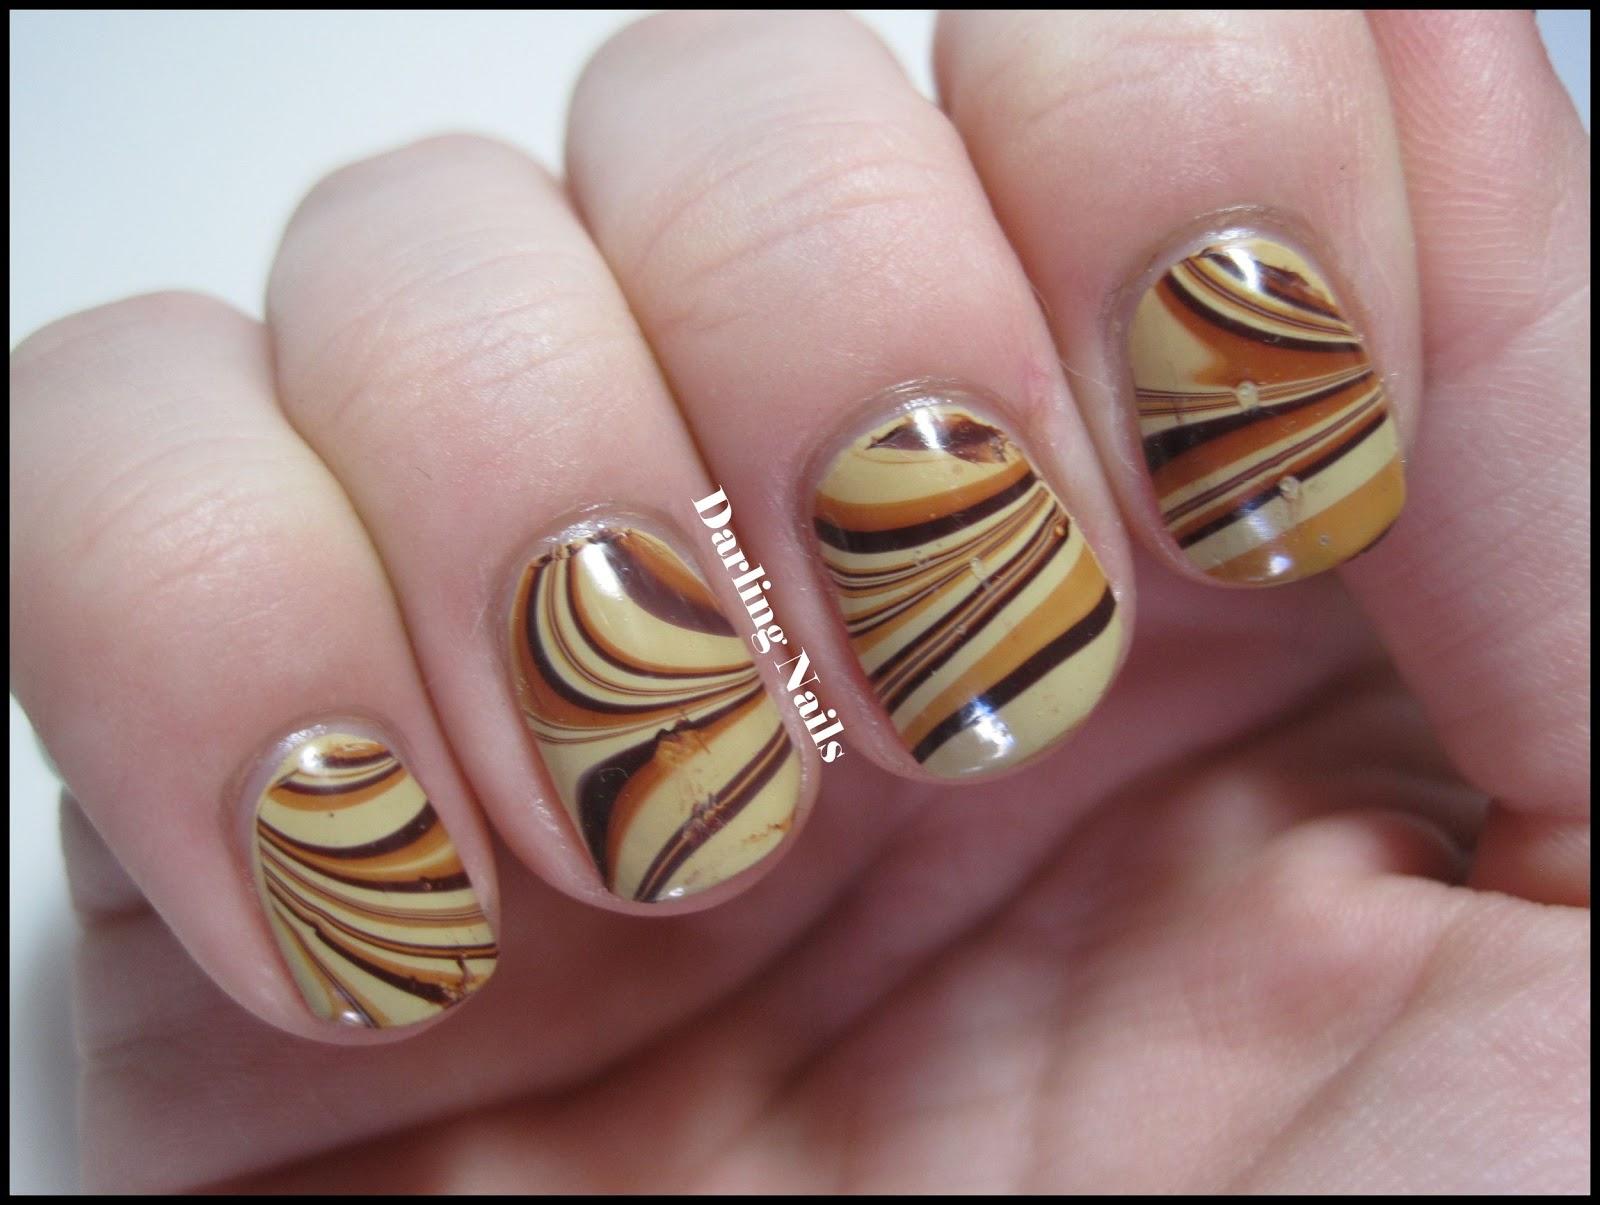 Darling Nails Caramel Toffee Swirls